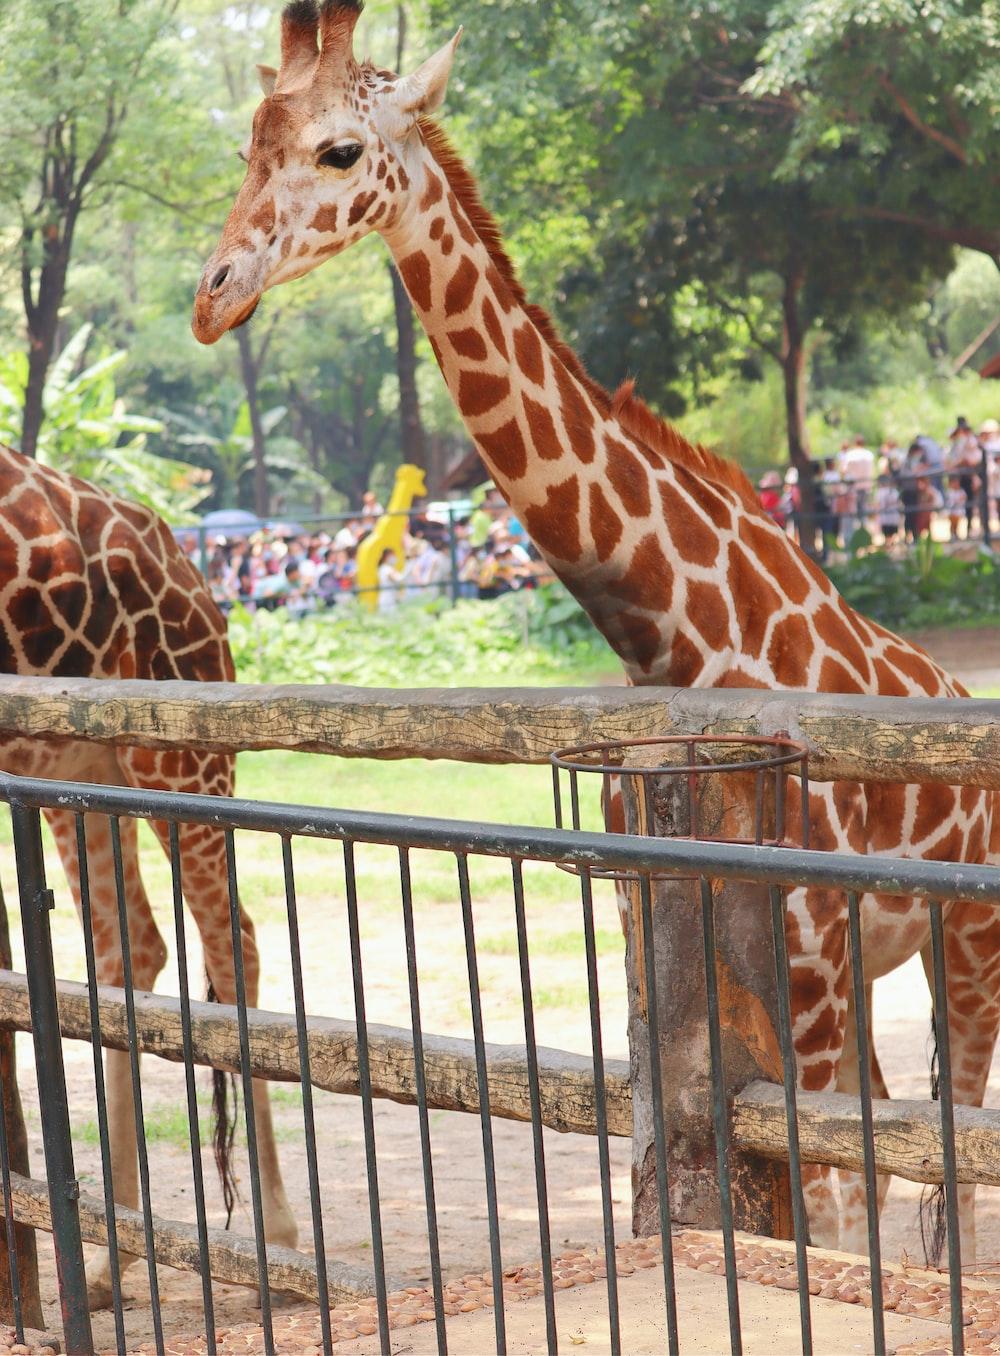 giraffe in cage during daytime